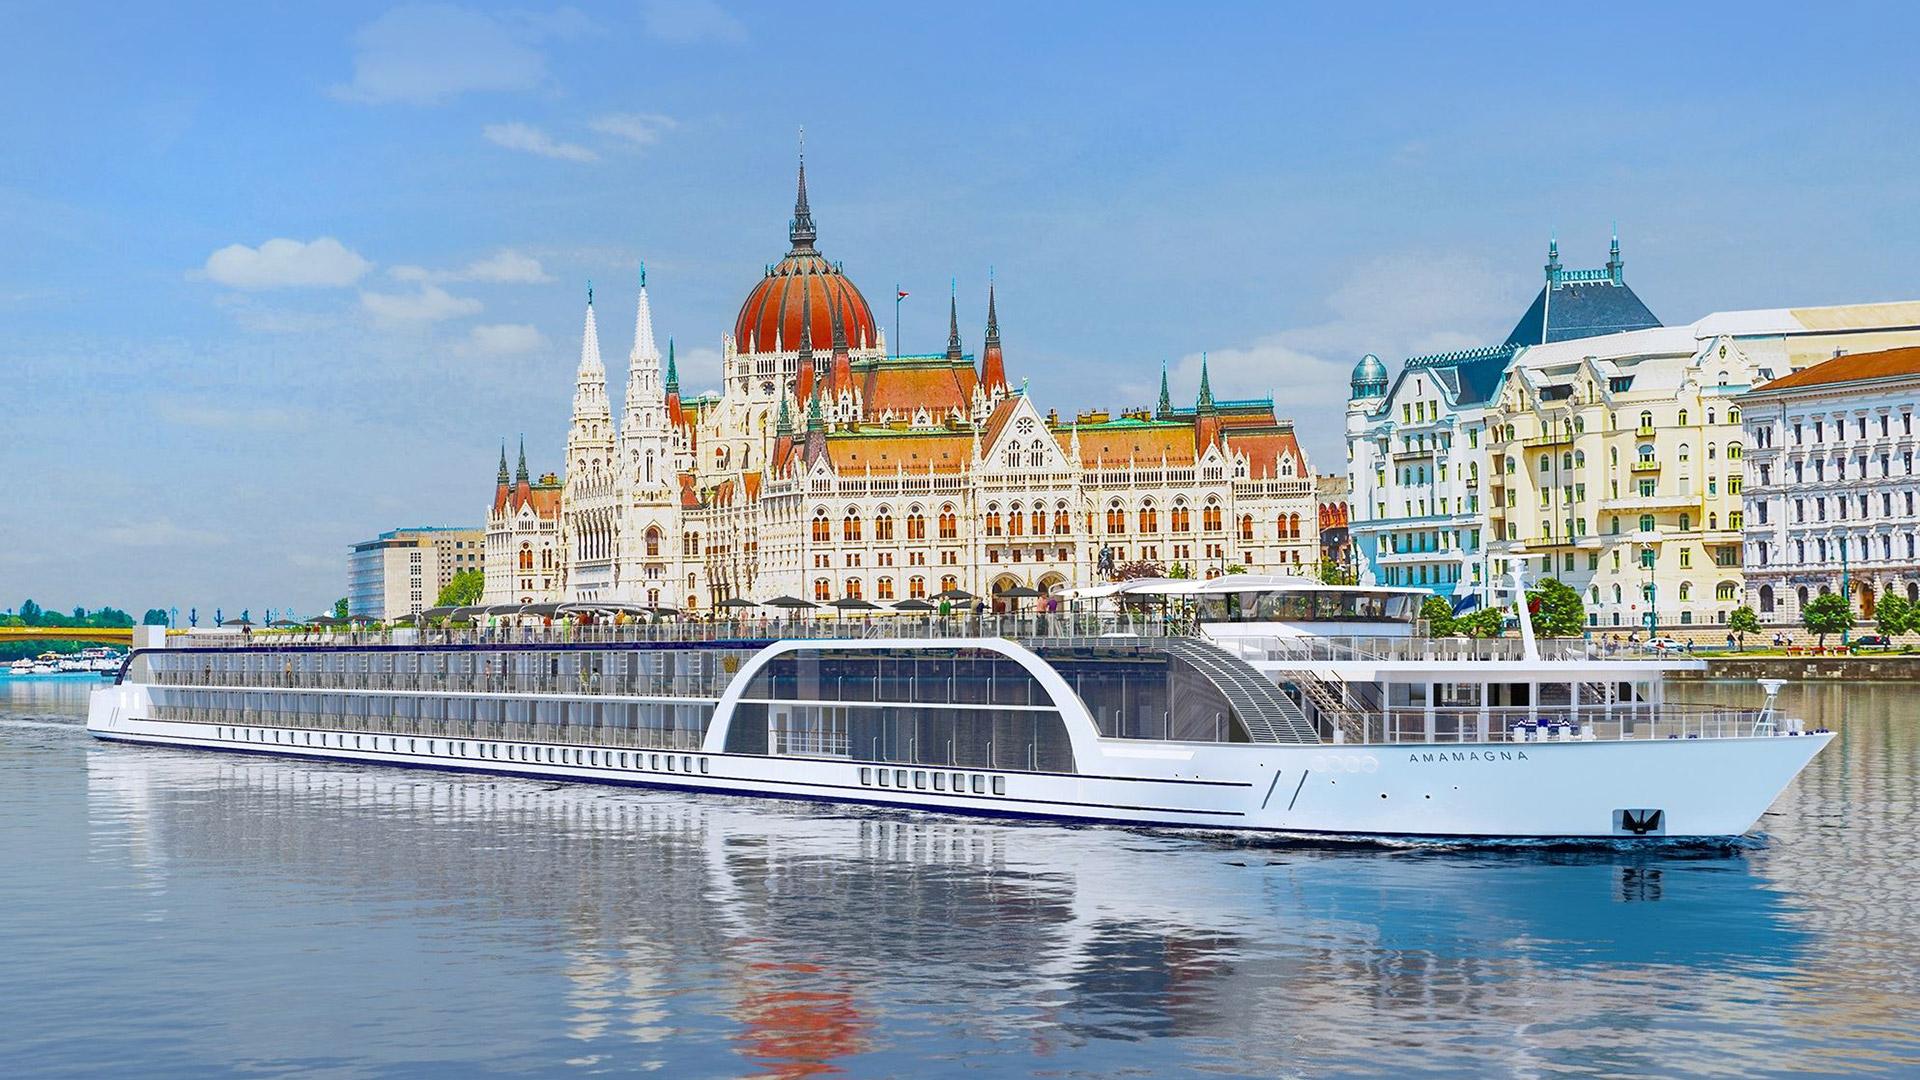 cruceros fluviales con Travel del Mar